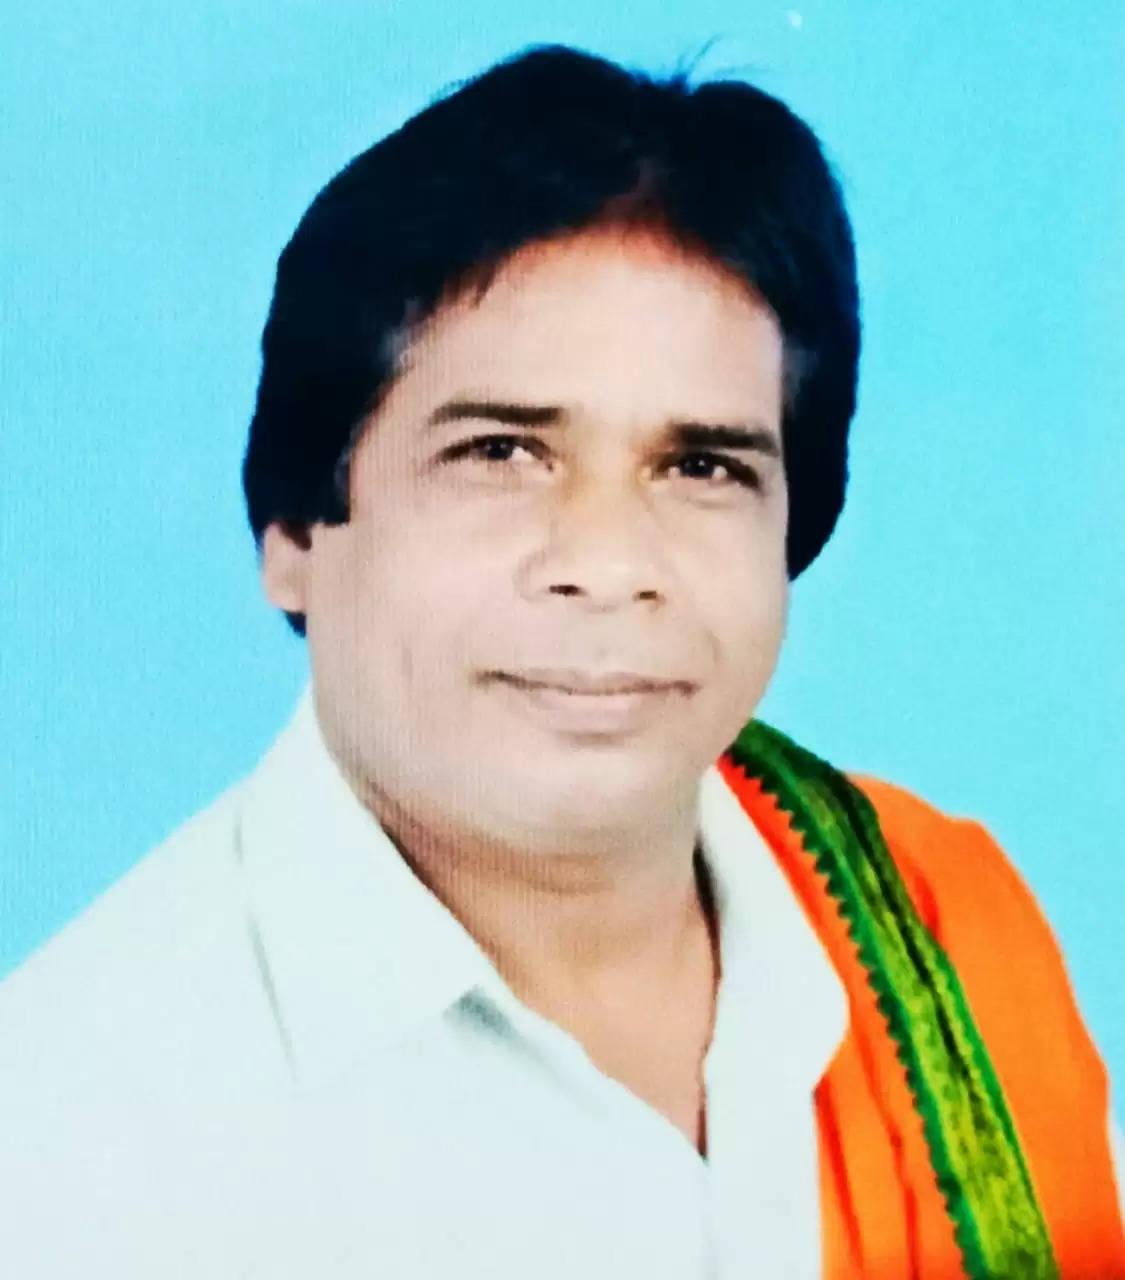 भाजपा मंडल अध्यक्ष श्री कृष्ण कुमार पटेल ने पीएम मोदी को दिया धन्यवाद